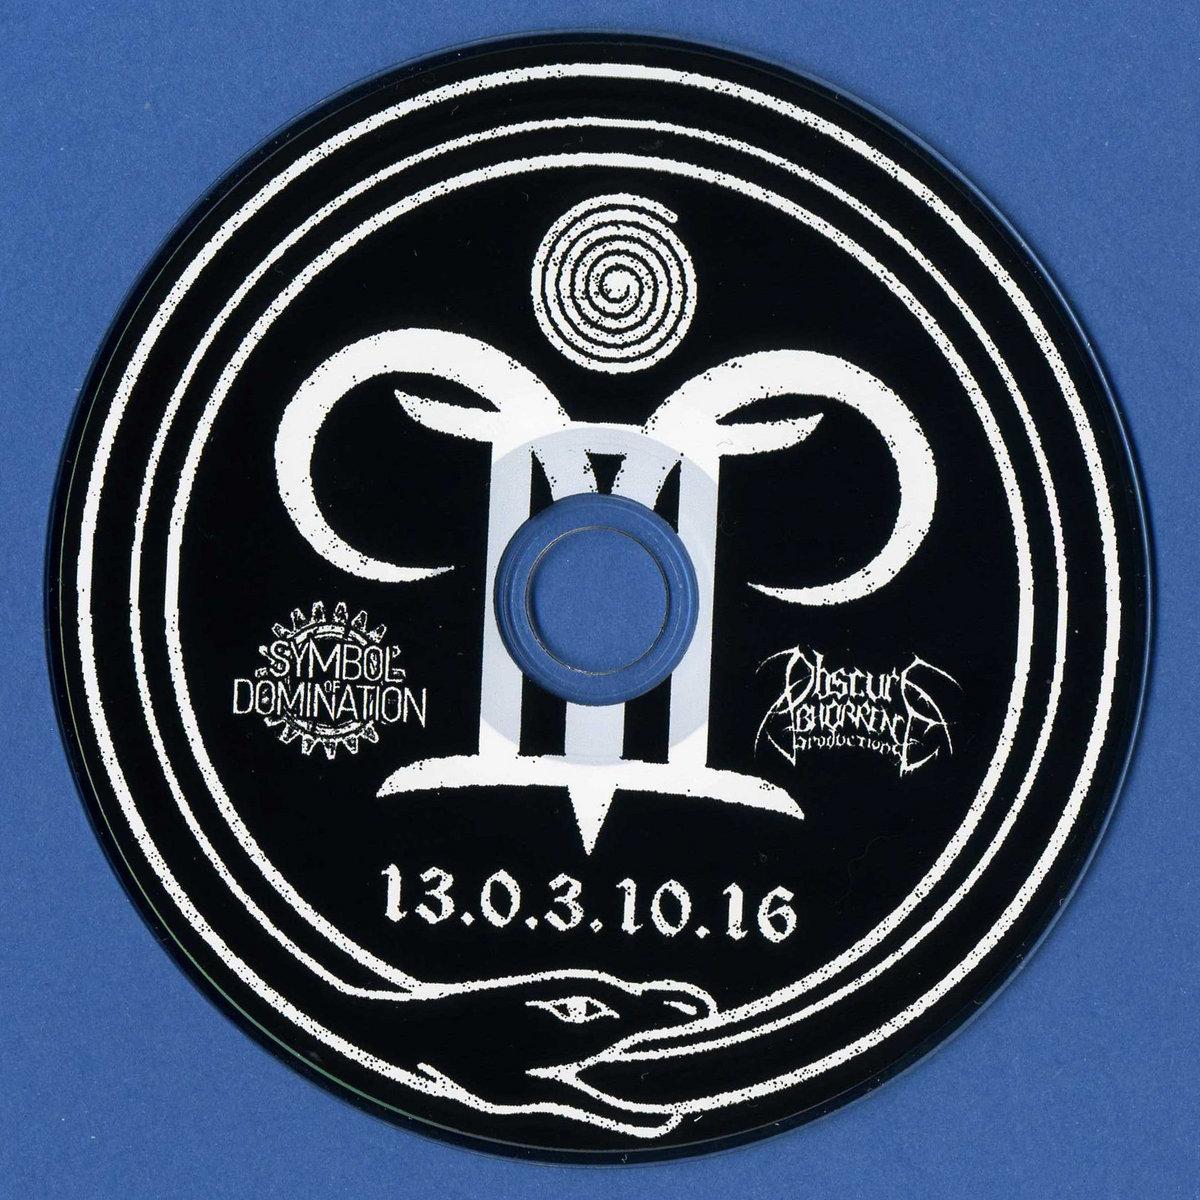 Sodp094 Pure Jaurais D 2017 Symbol Of Domination Prod